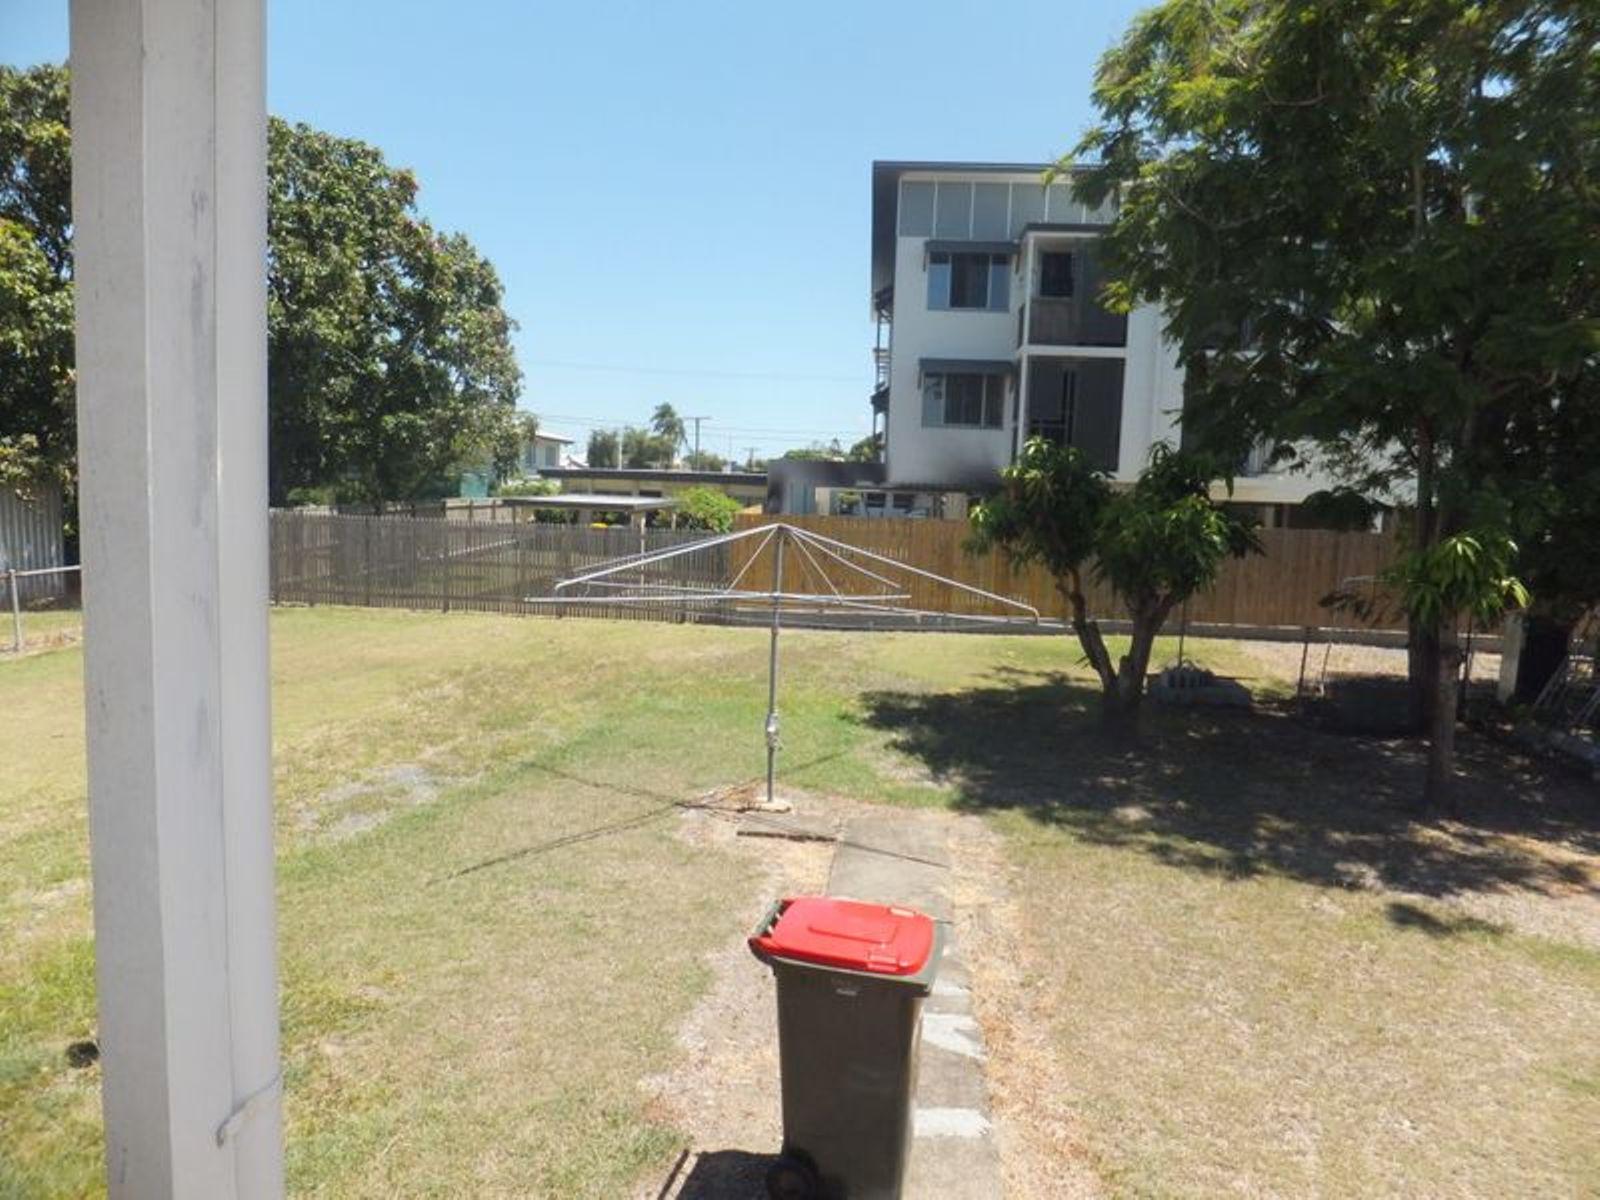 67-69 Burnett St, Berserker, QLD 4701